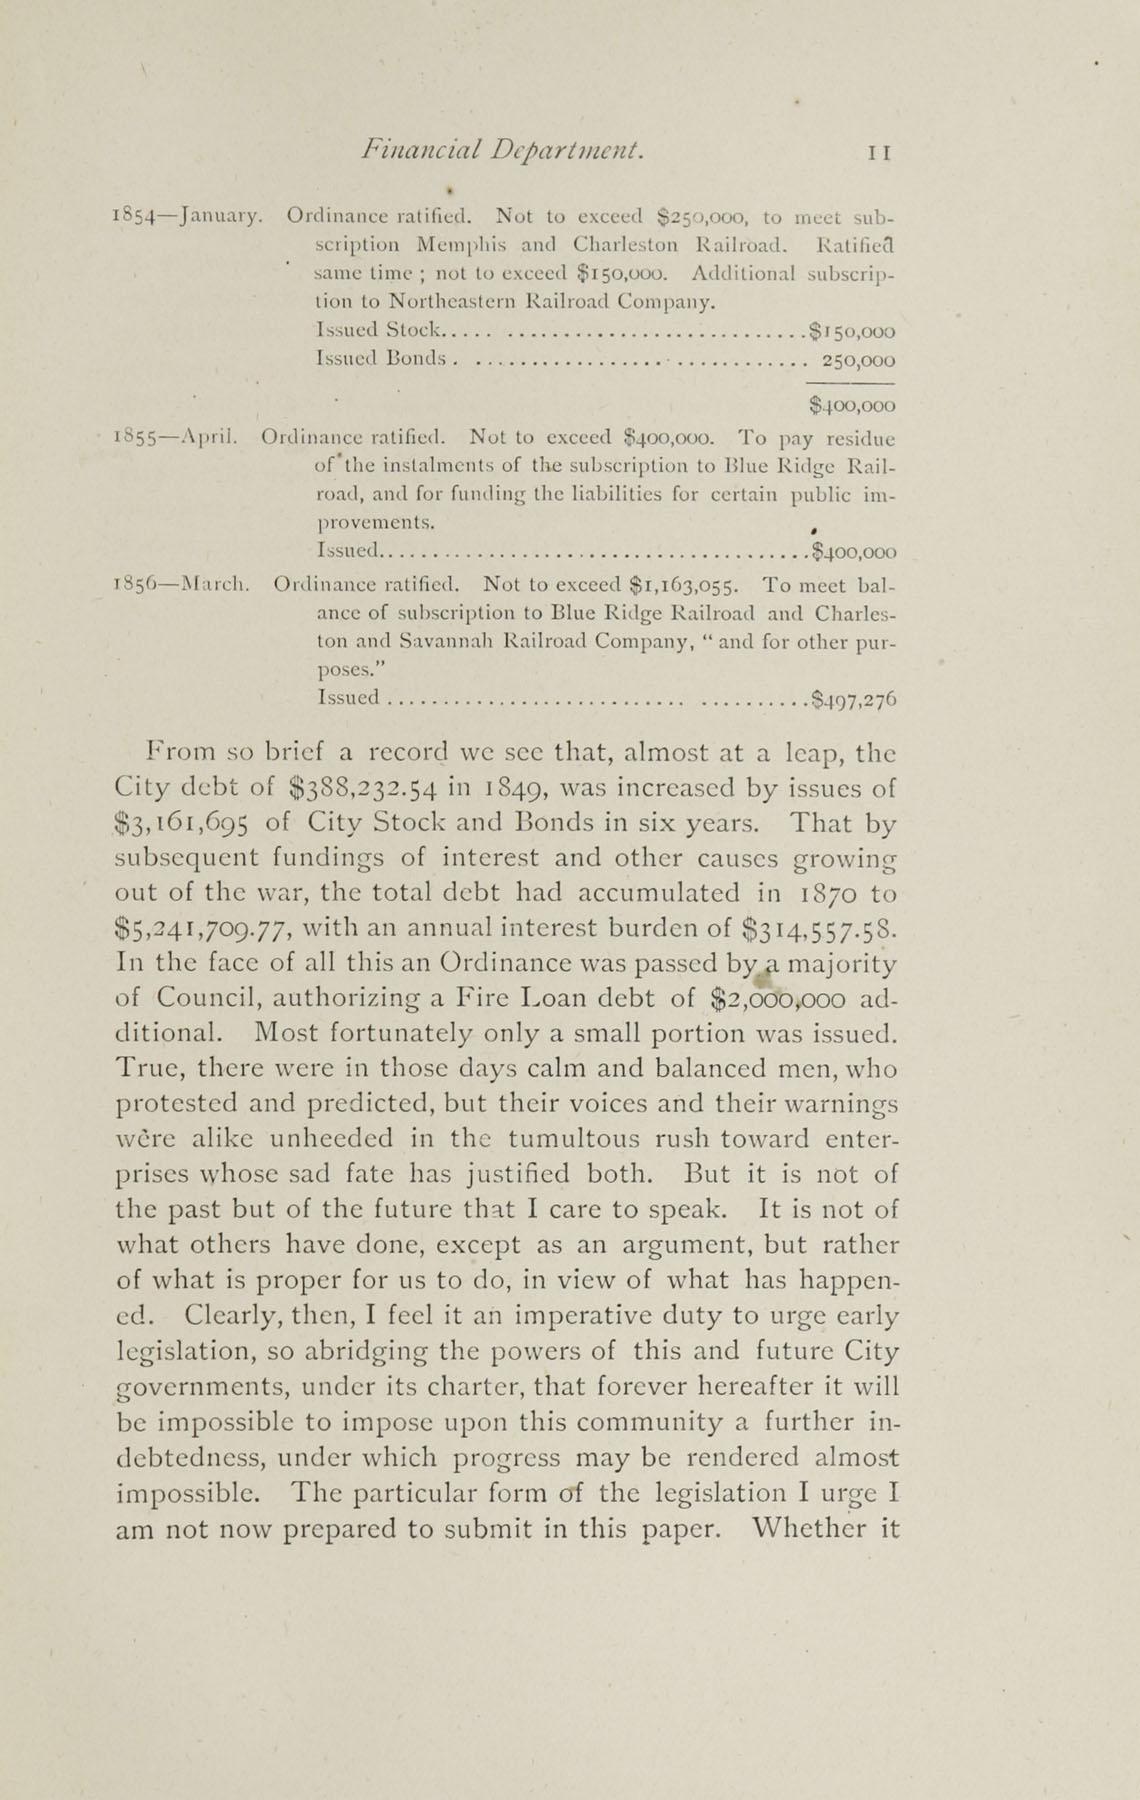 Charleston Year book, 1880, page 11